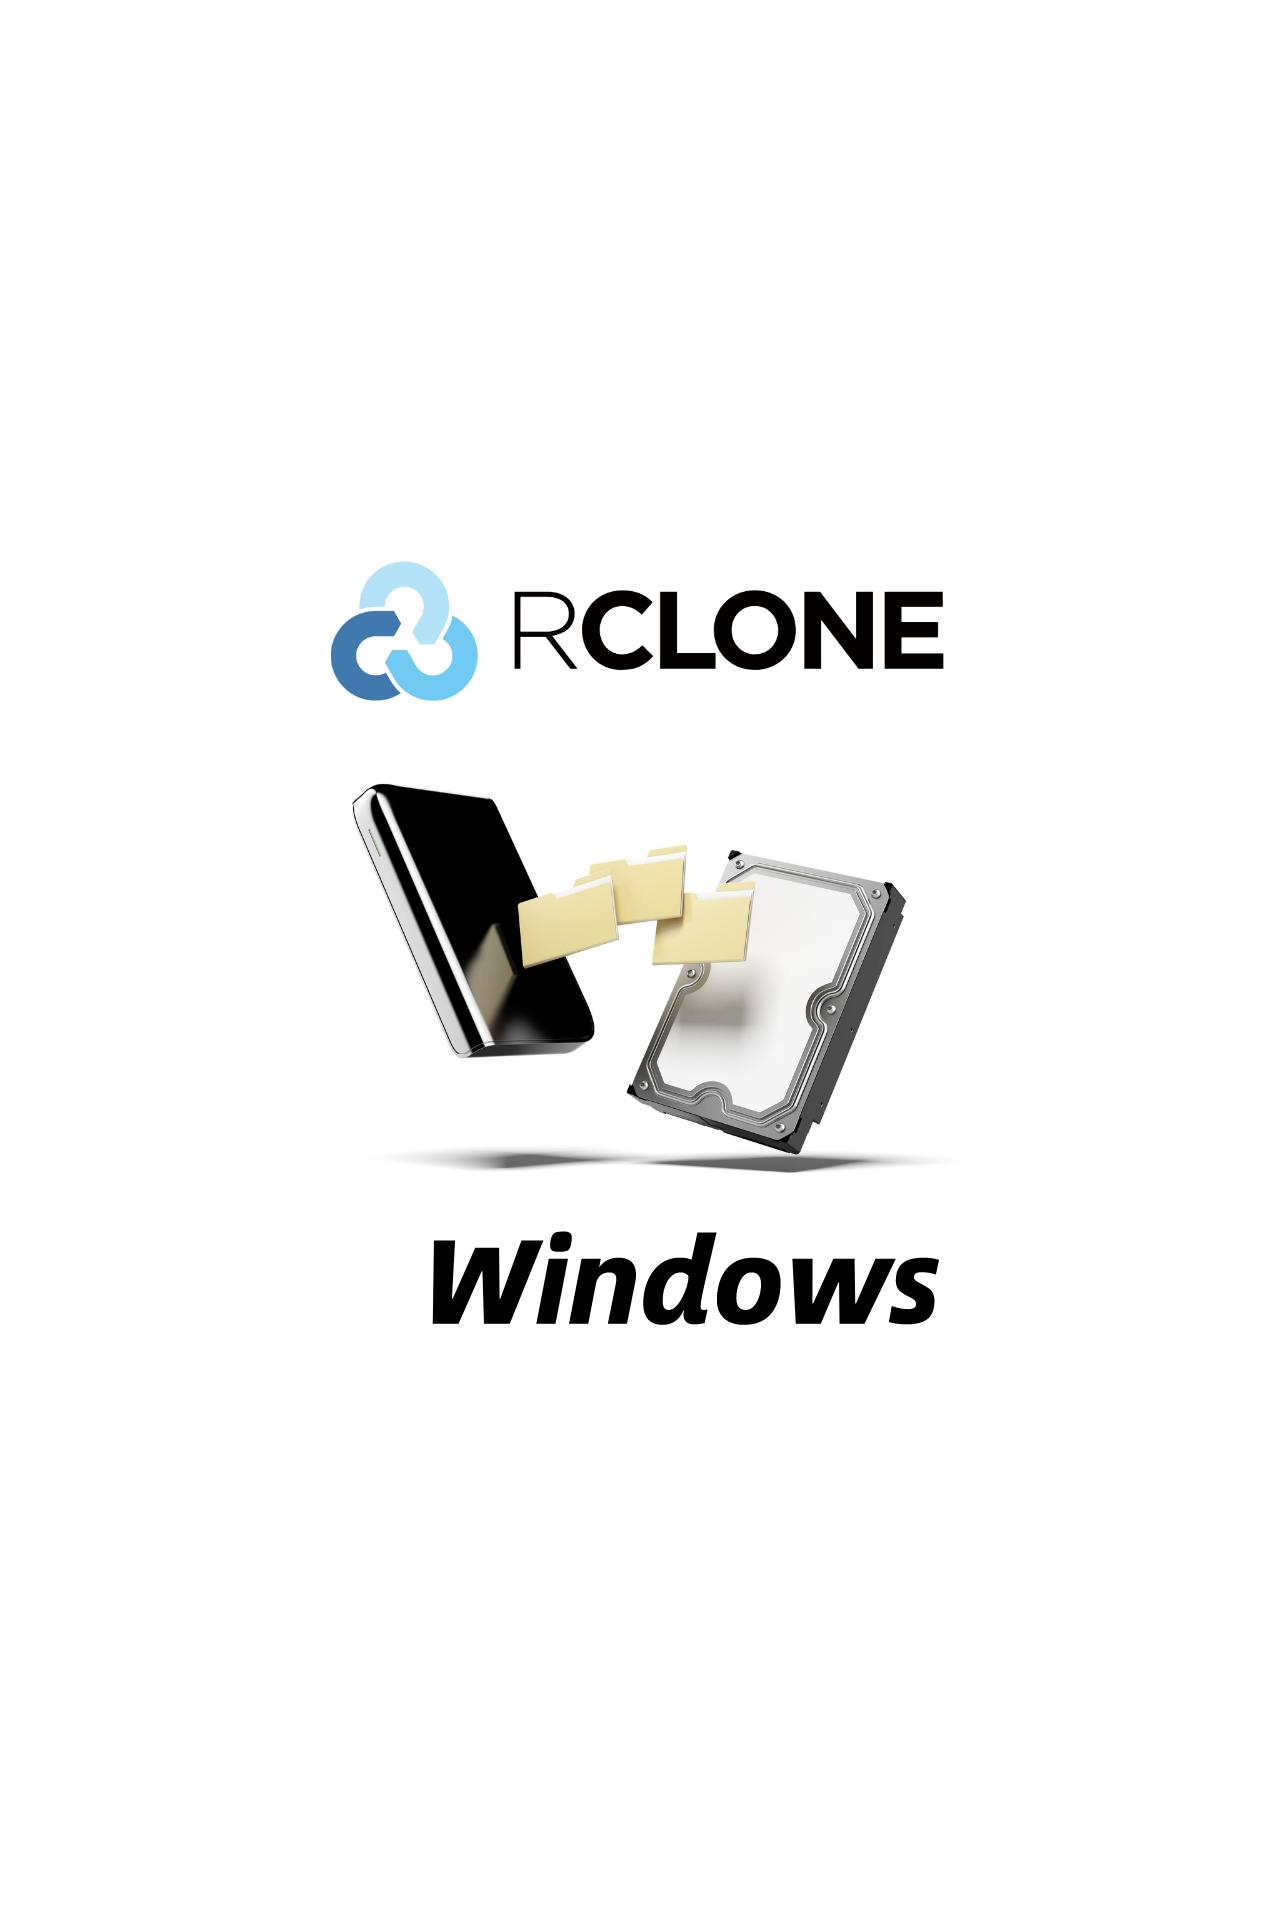 Rclone挂载OneDrive为本地硬盘-Windows篇